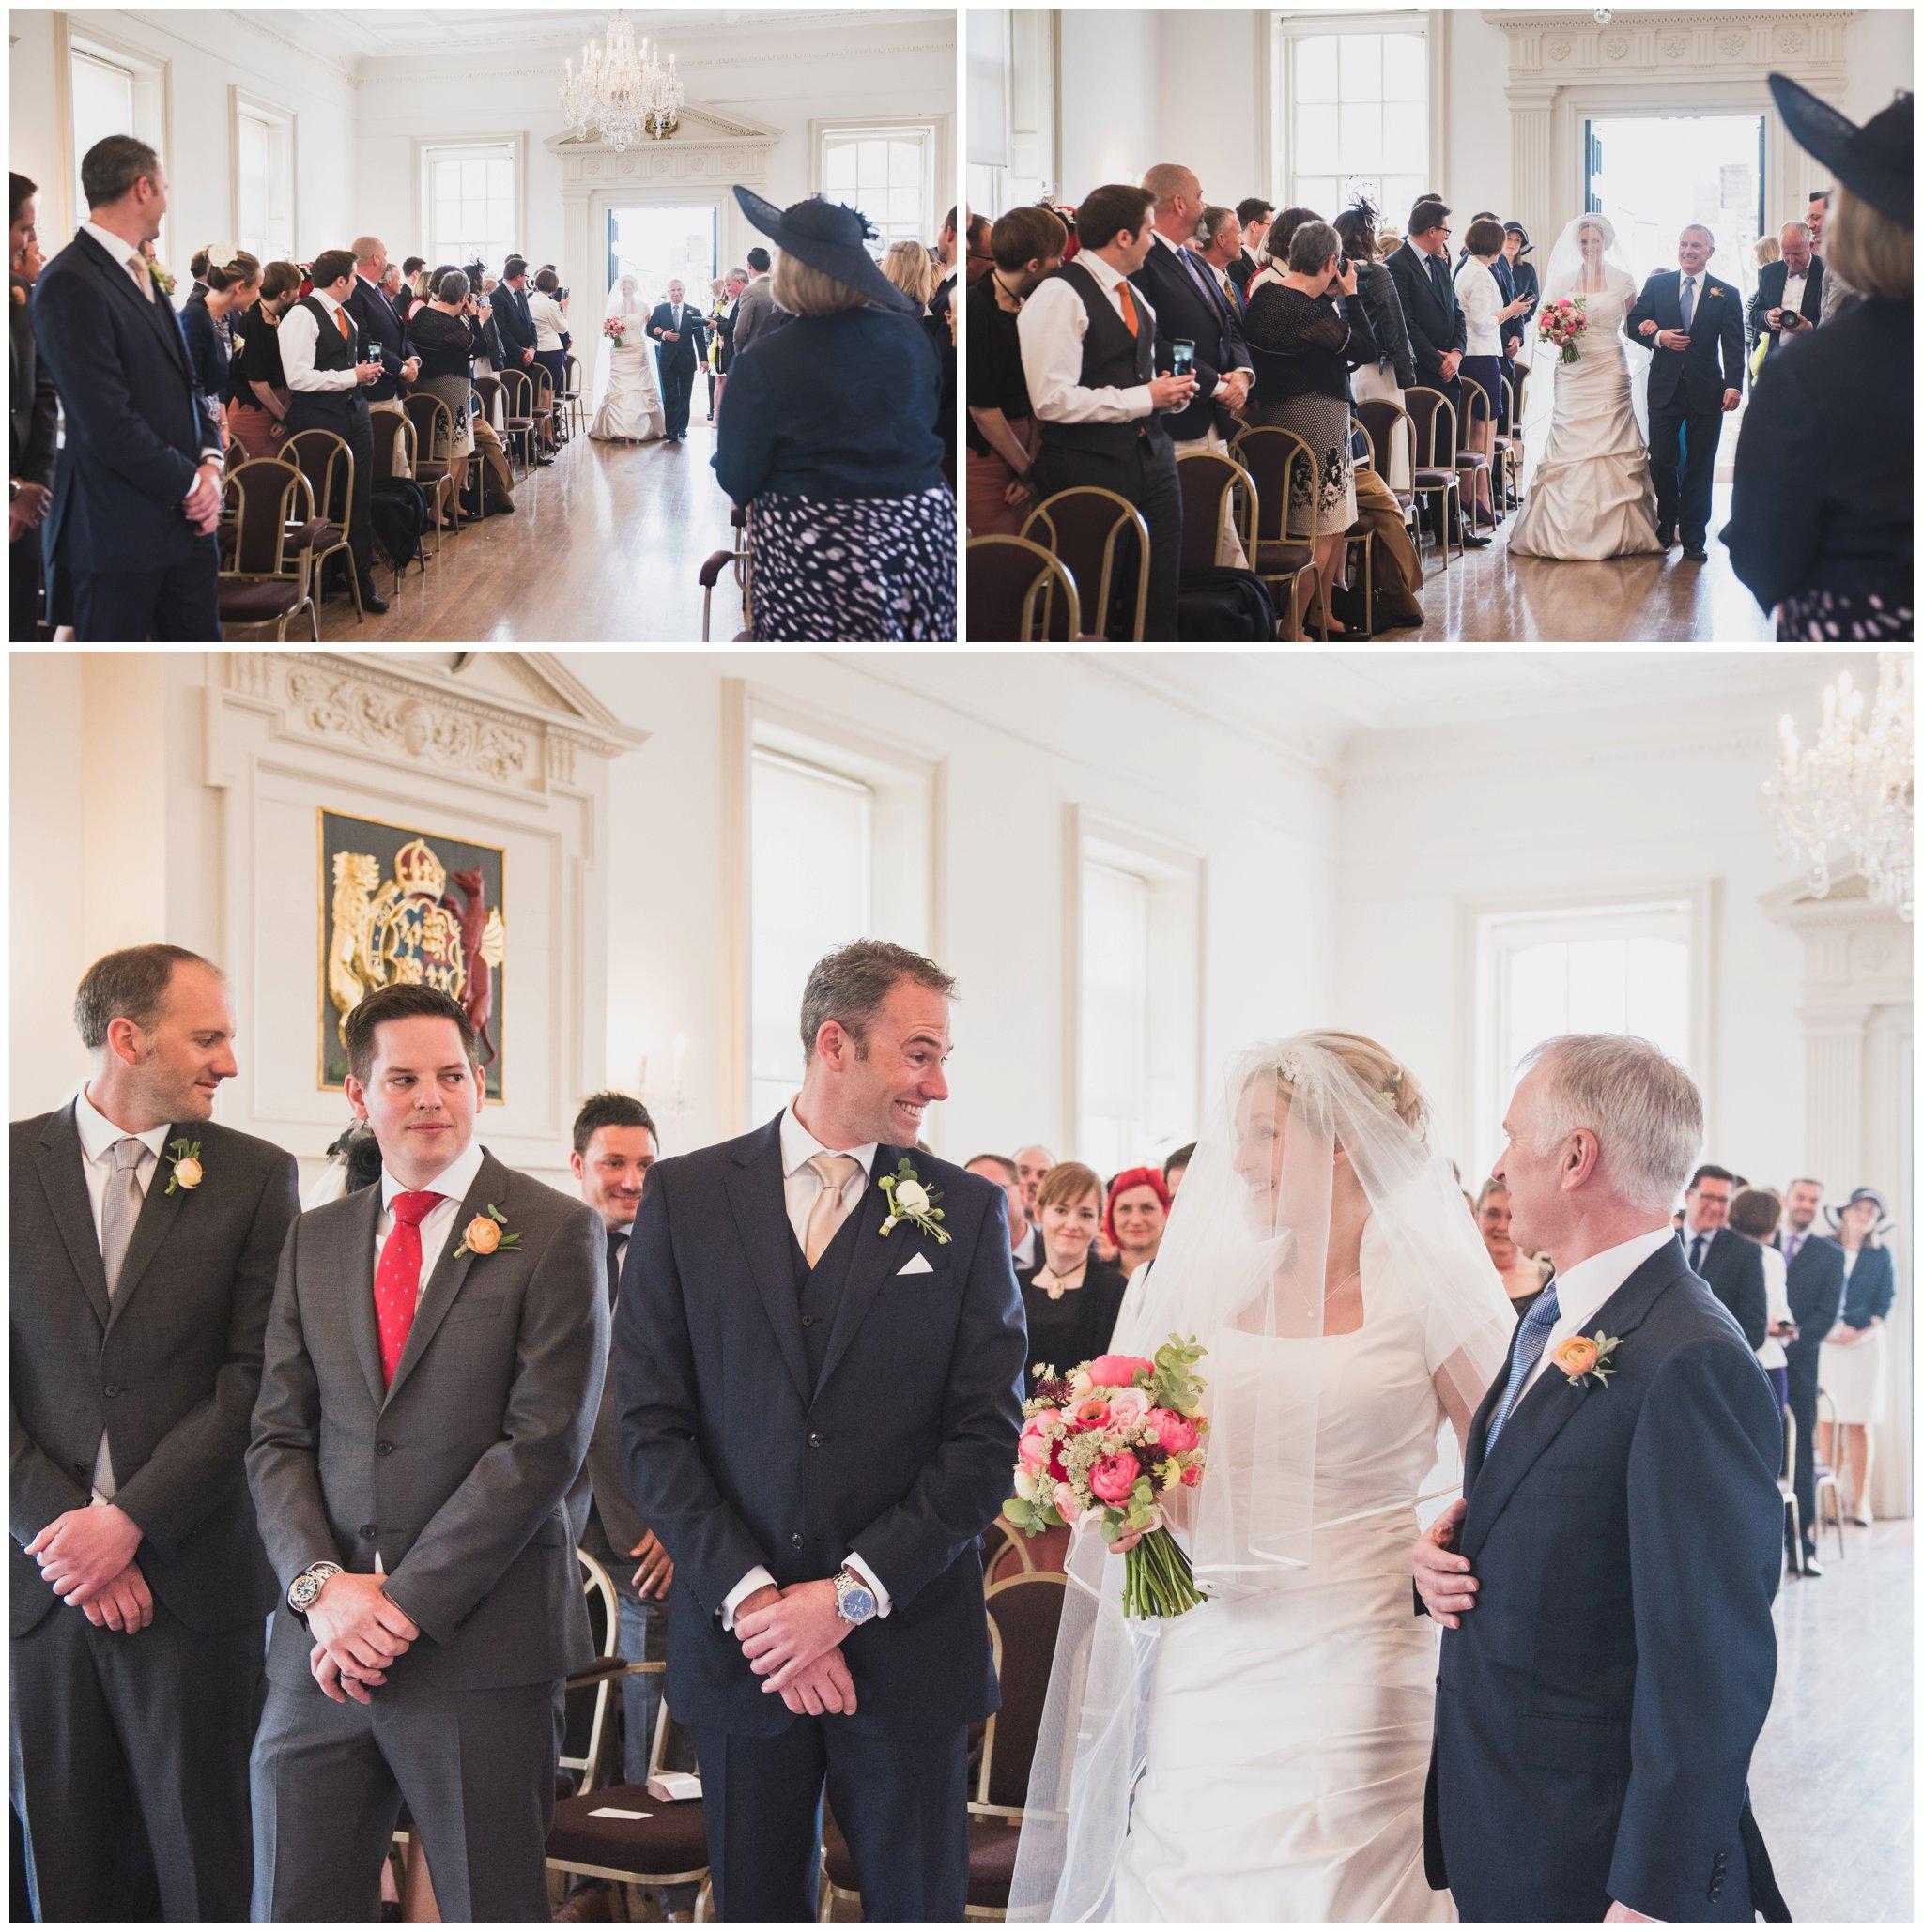 poole guildhall wedding brides entrance into ceremony room